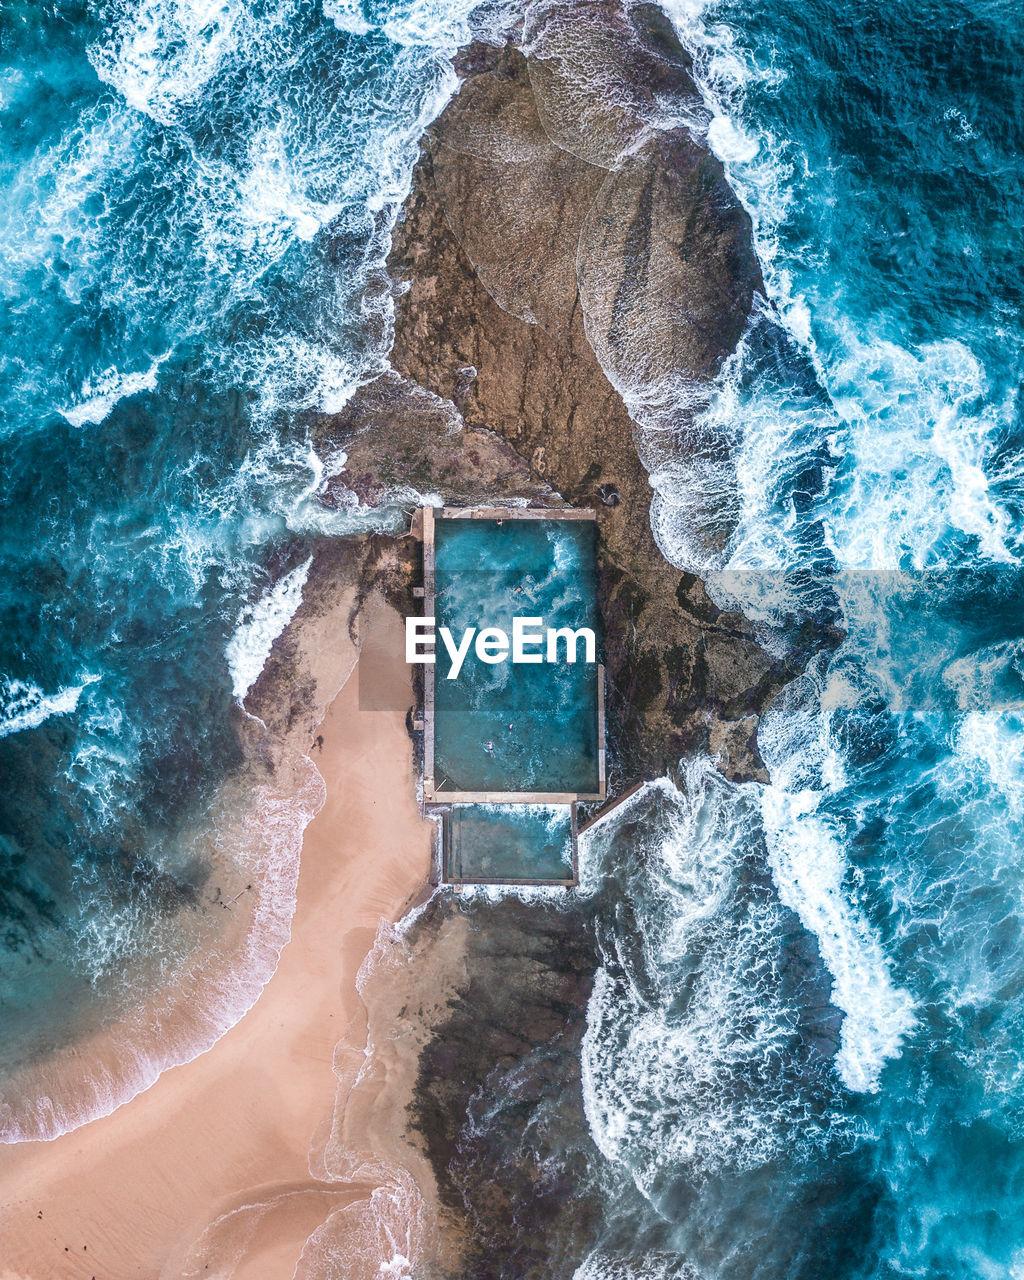 Aerial view of waves splashing on rocks at beach